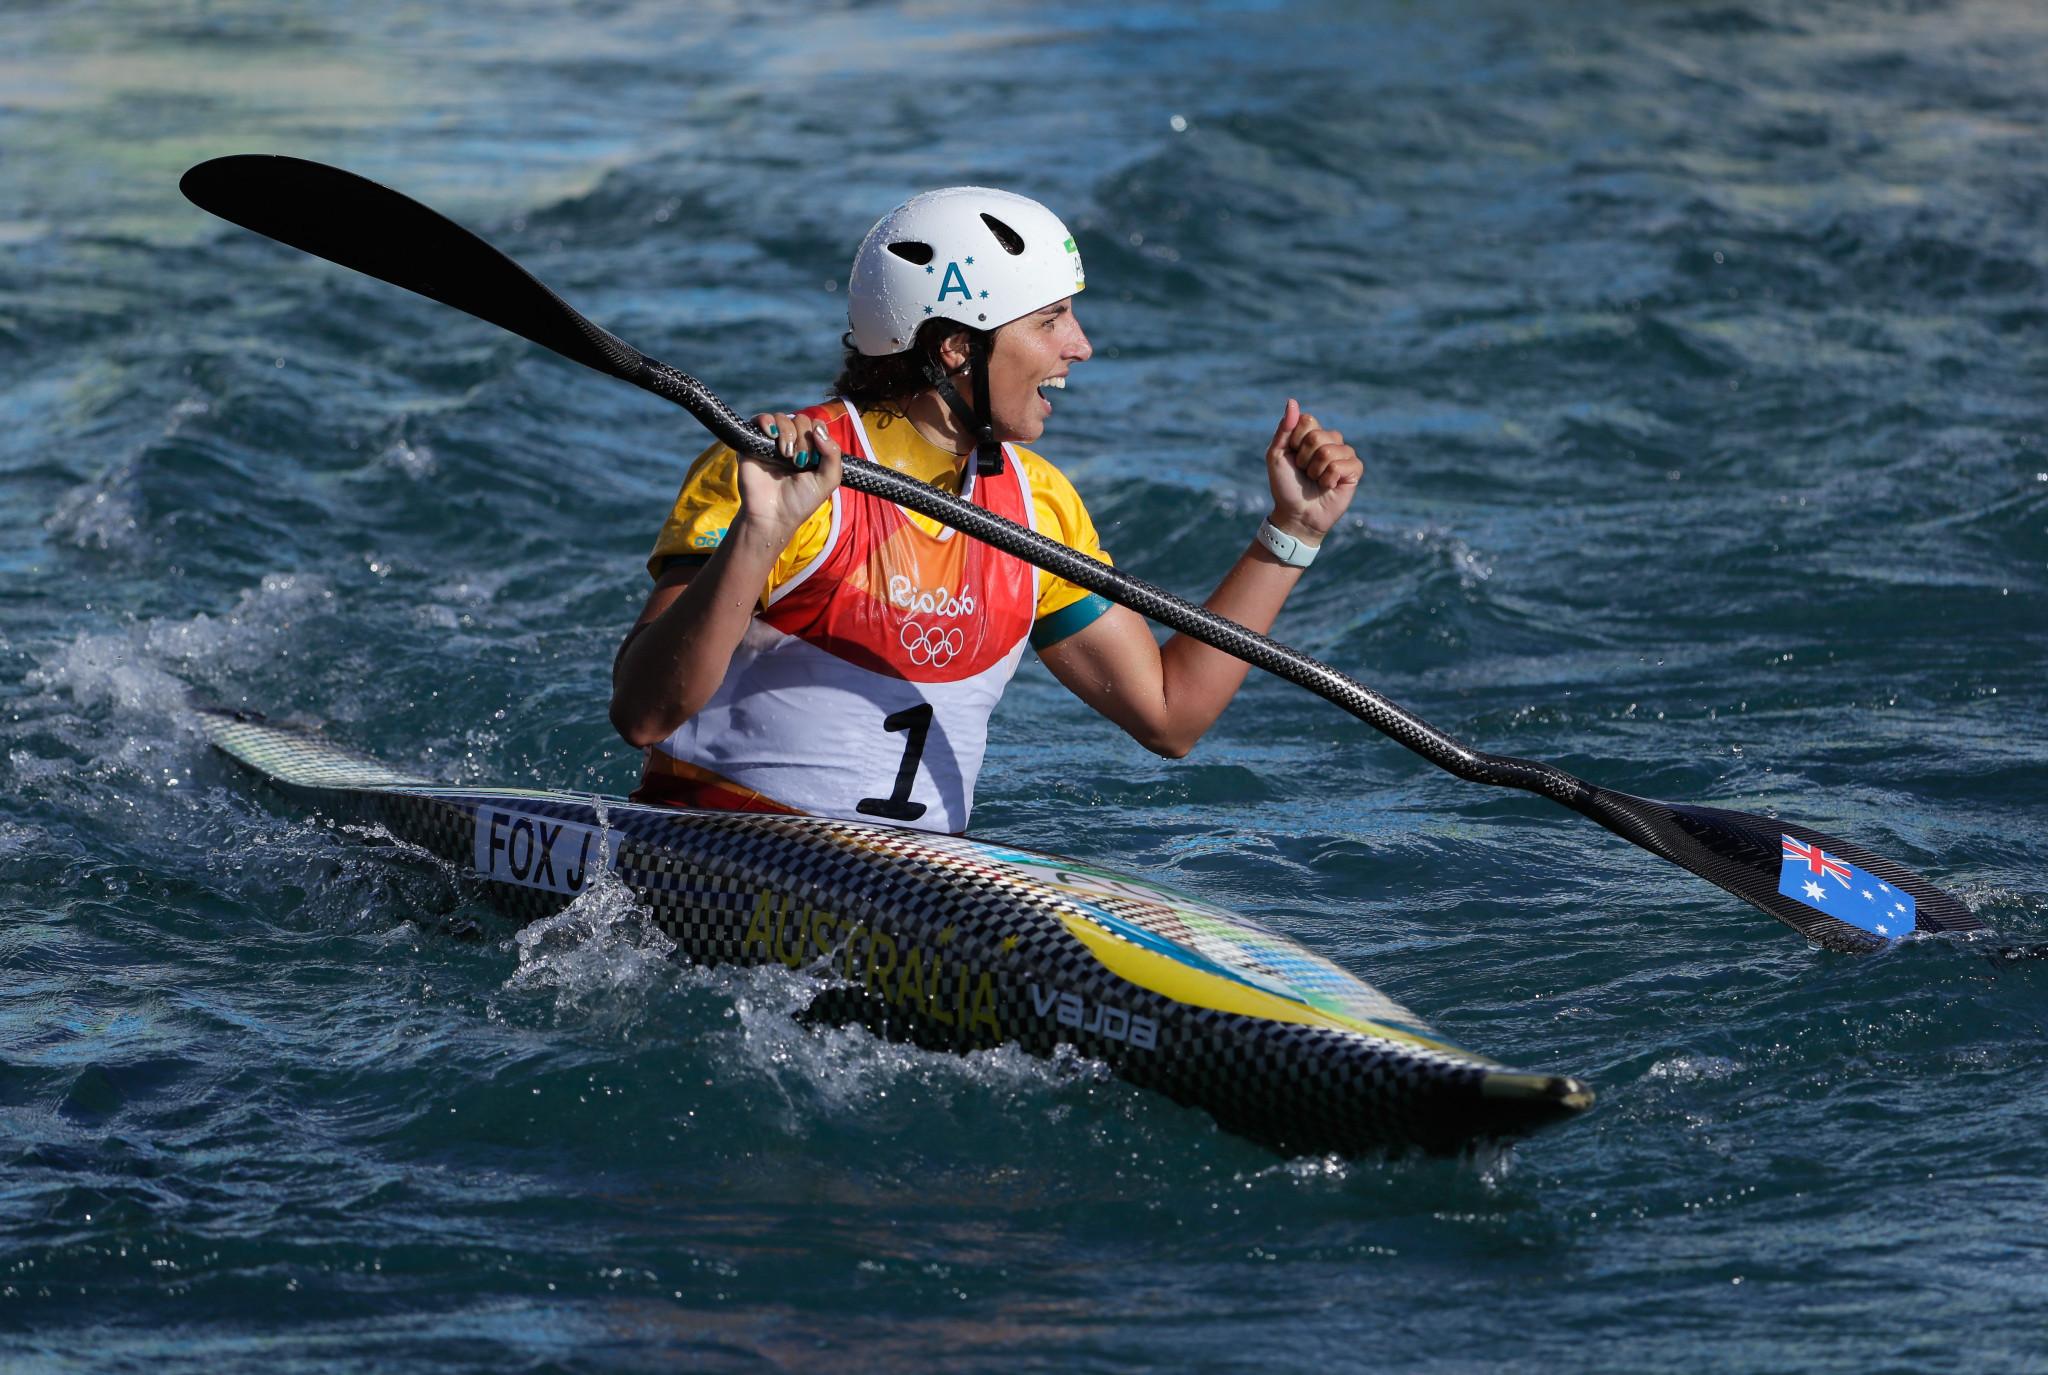 Fox seeks to maintain winning streak at ICF Canoe Slalom World Cup